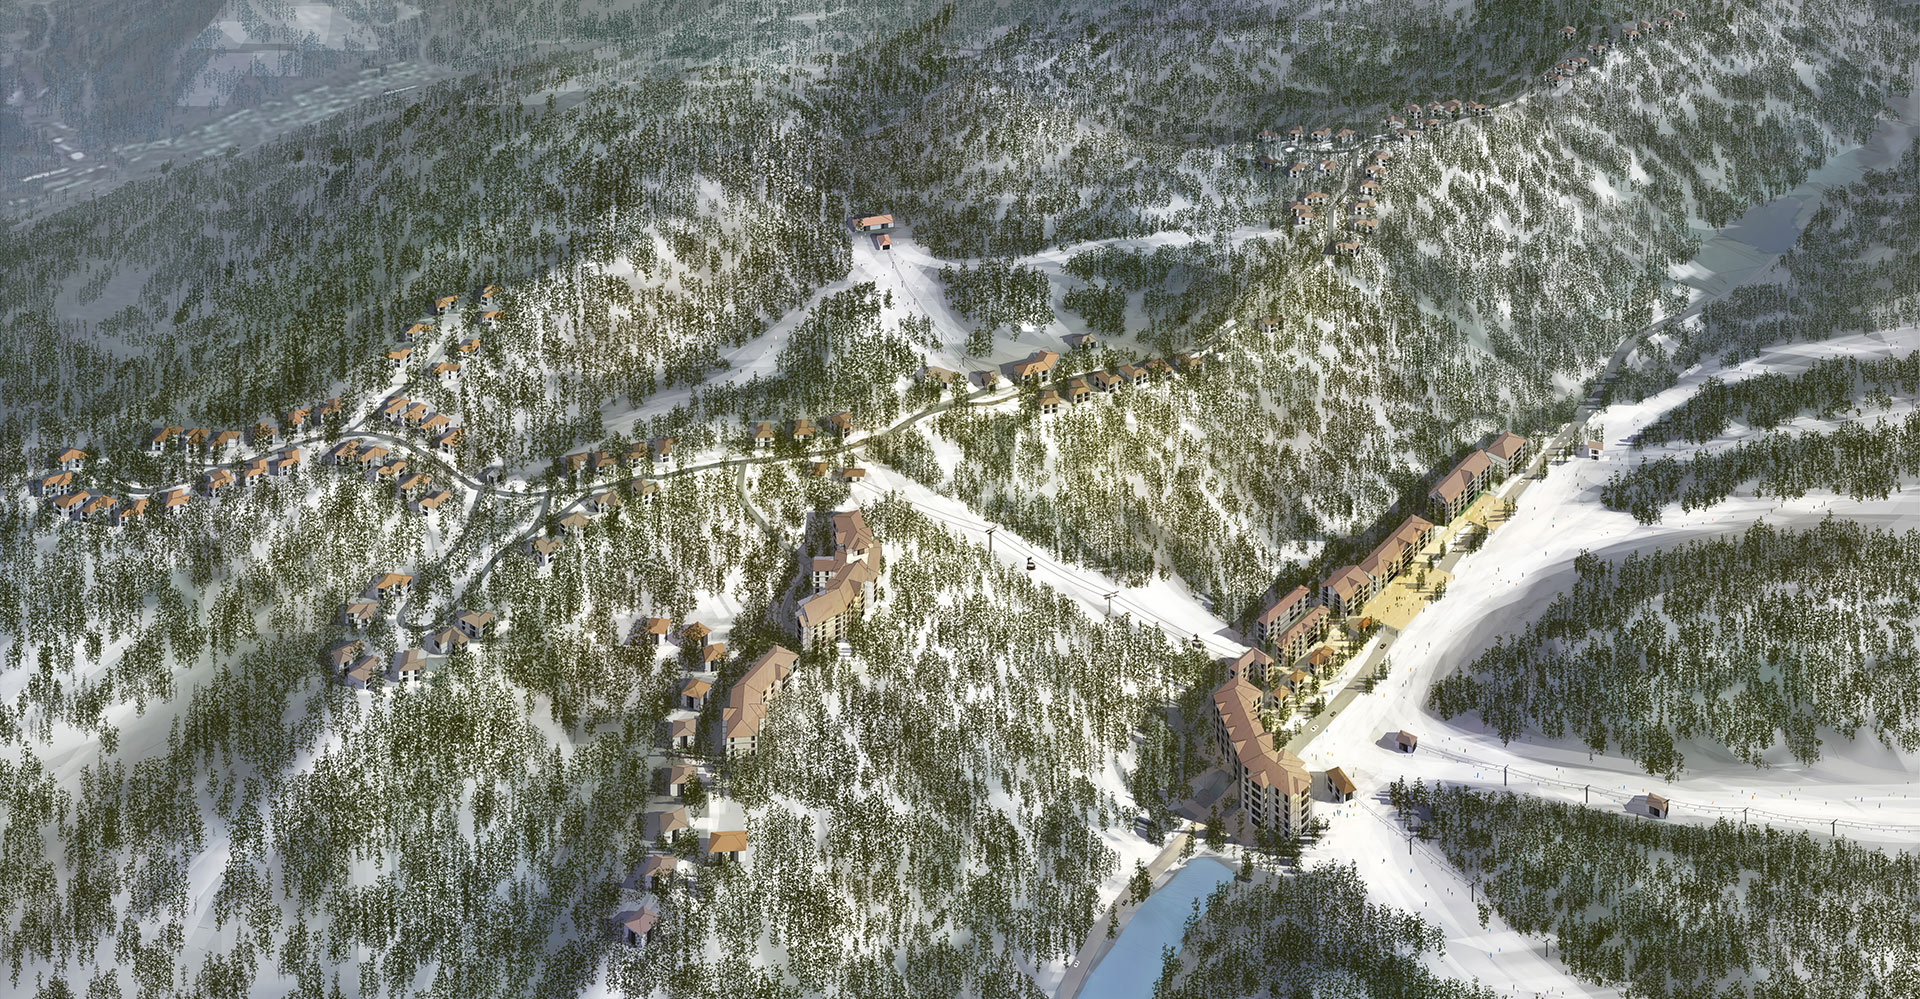 Chongli Ski and Mountain Resort WATG view 2